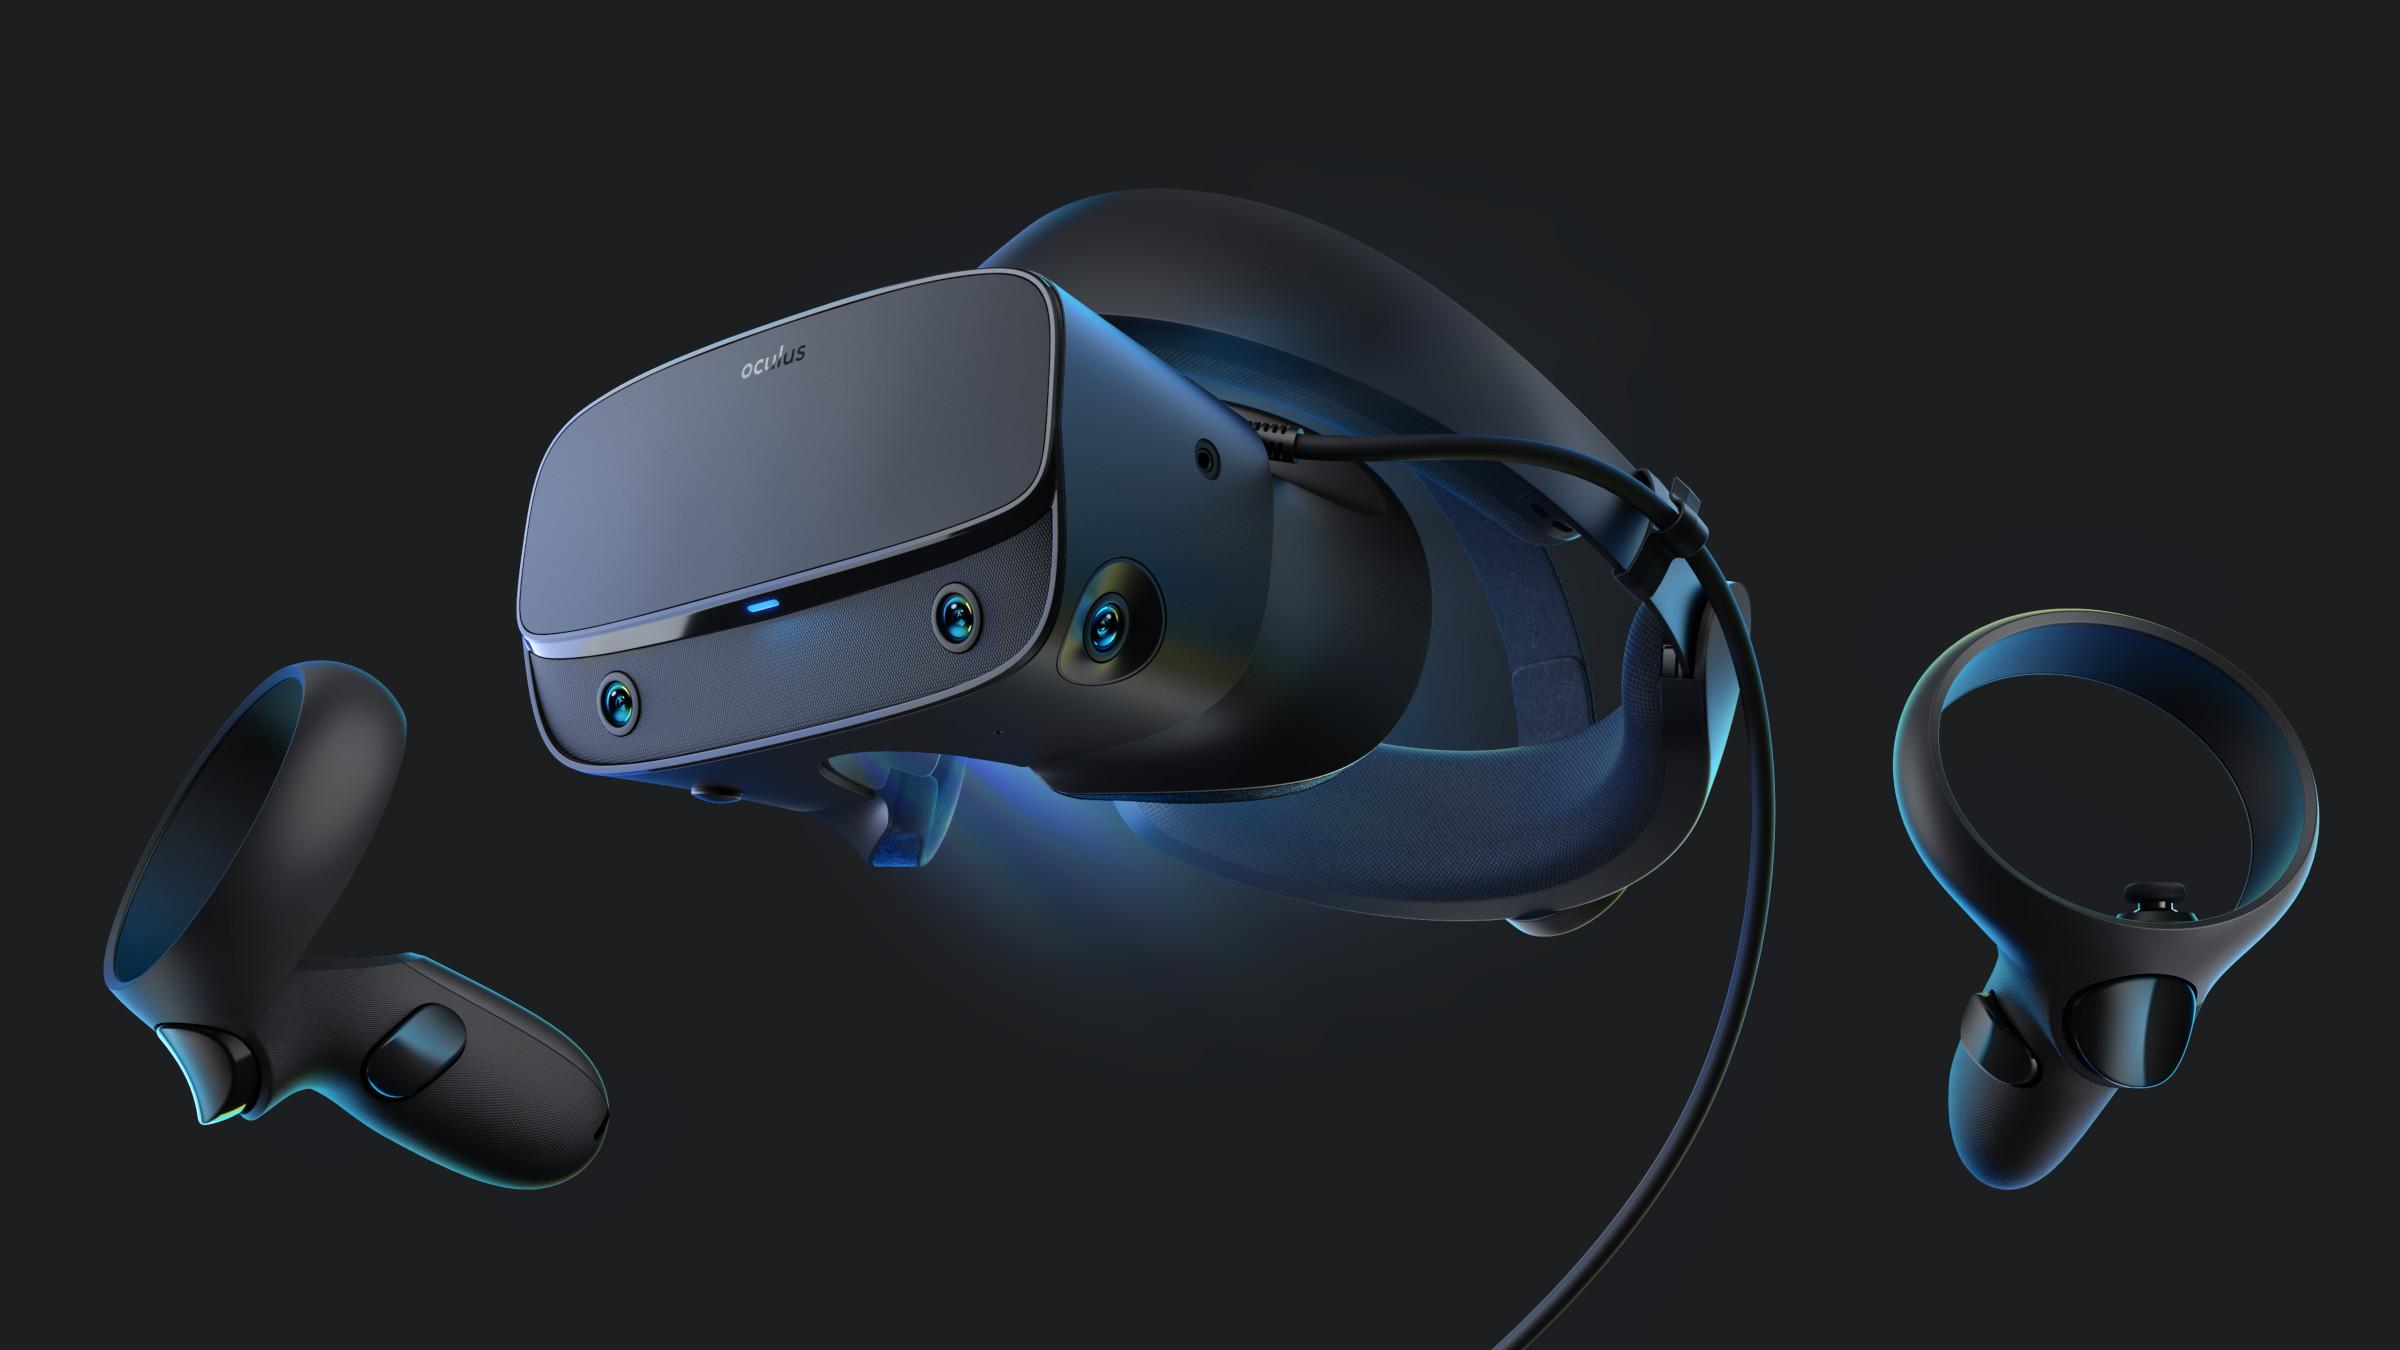 Oculus Rift S review | PC Gamer